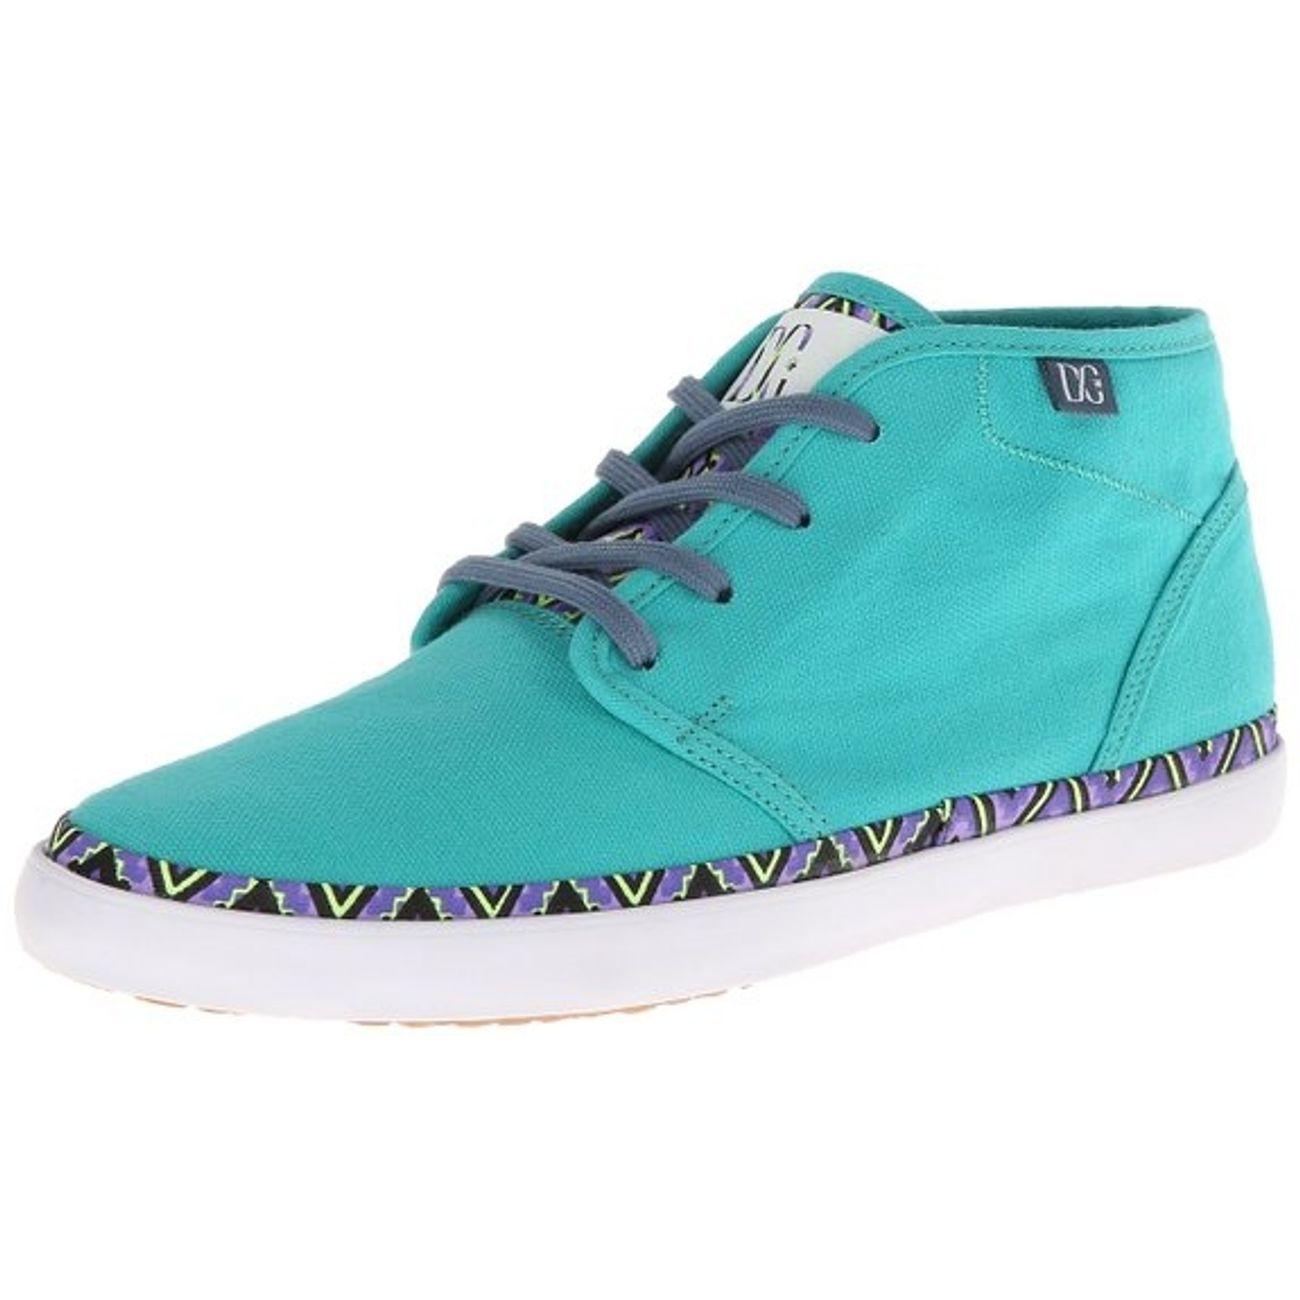 Dc Studio Yellow ModeLifestyle Shoes Mid Green Ltz Femme 8N0mnw